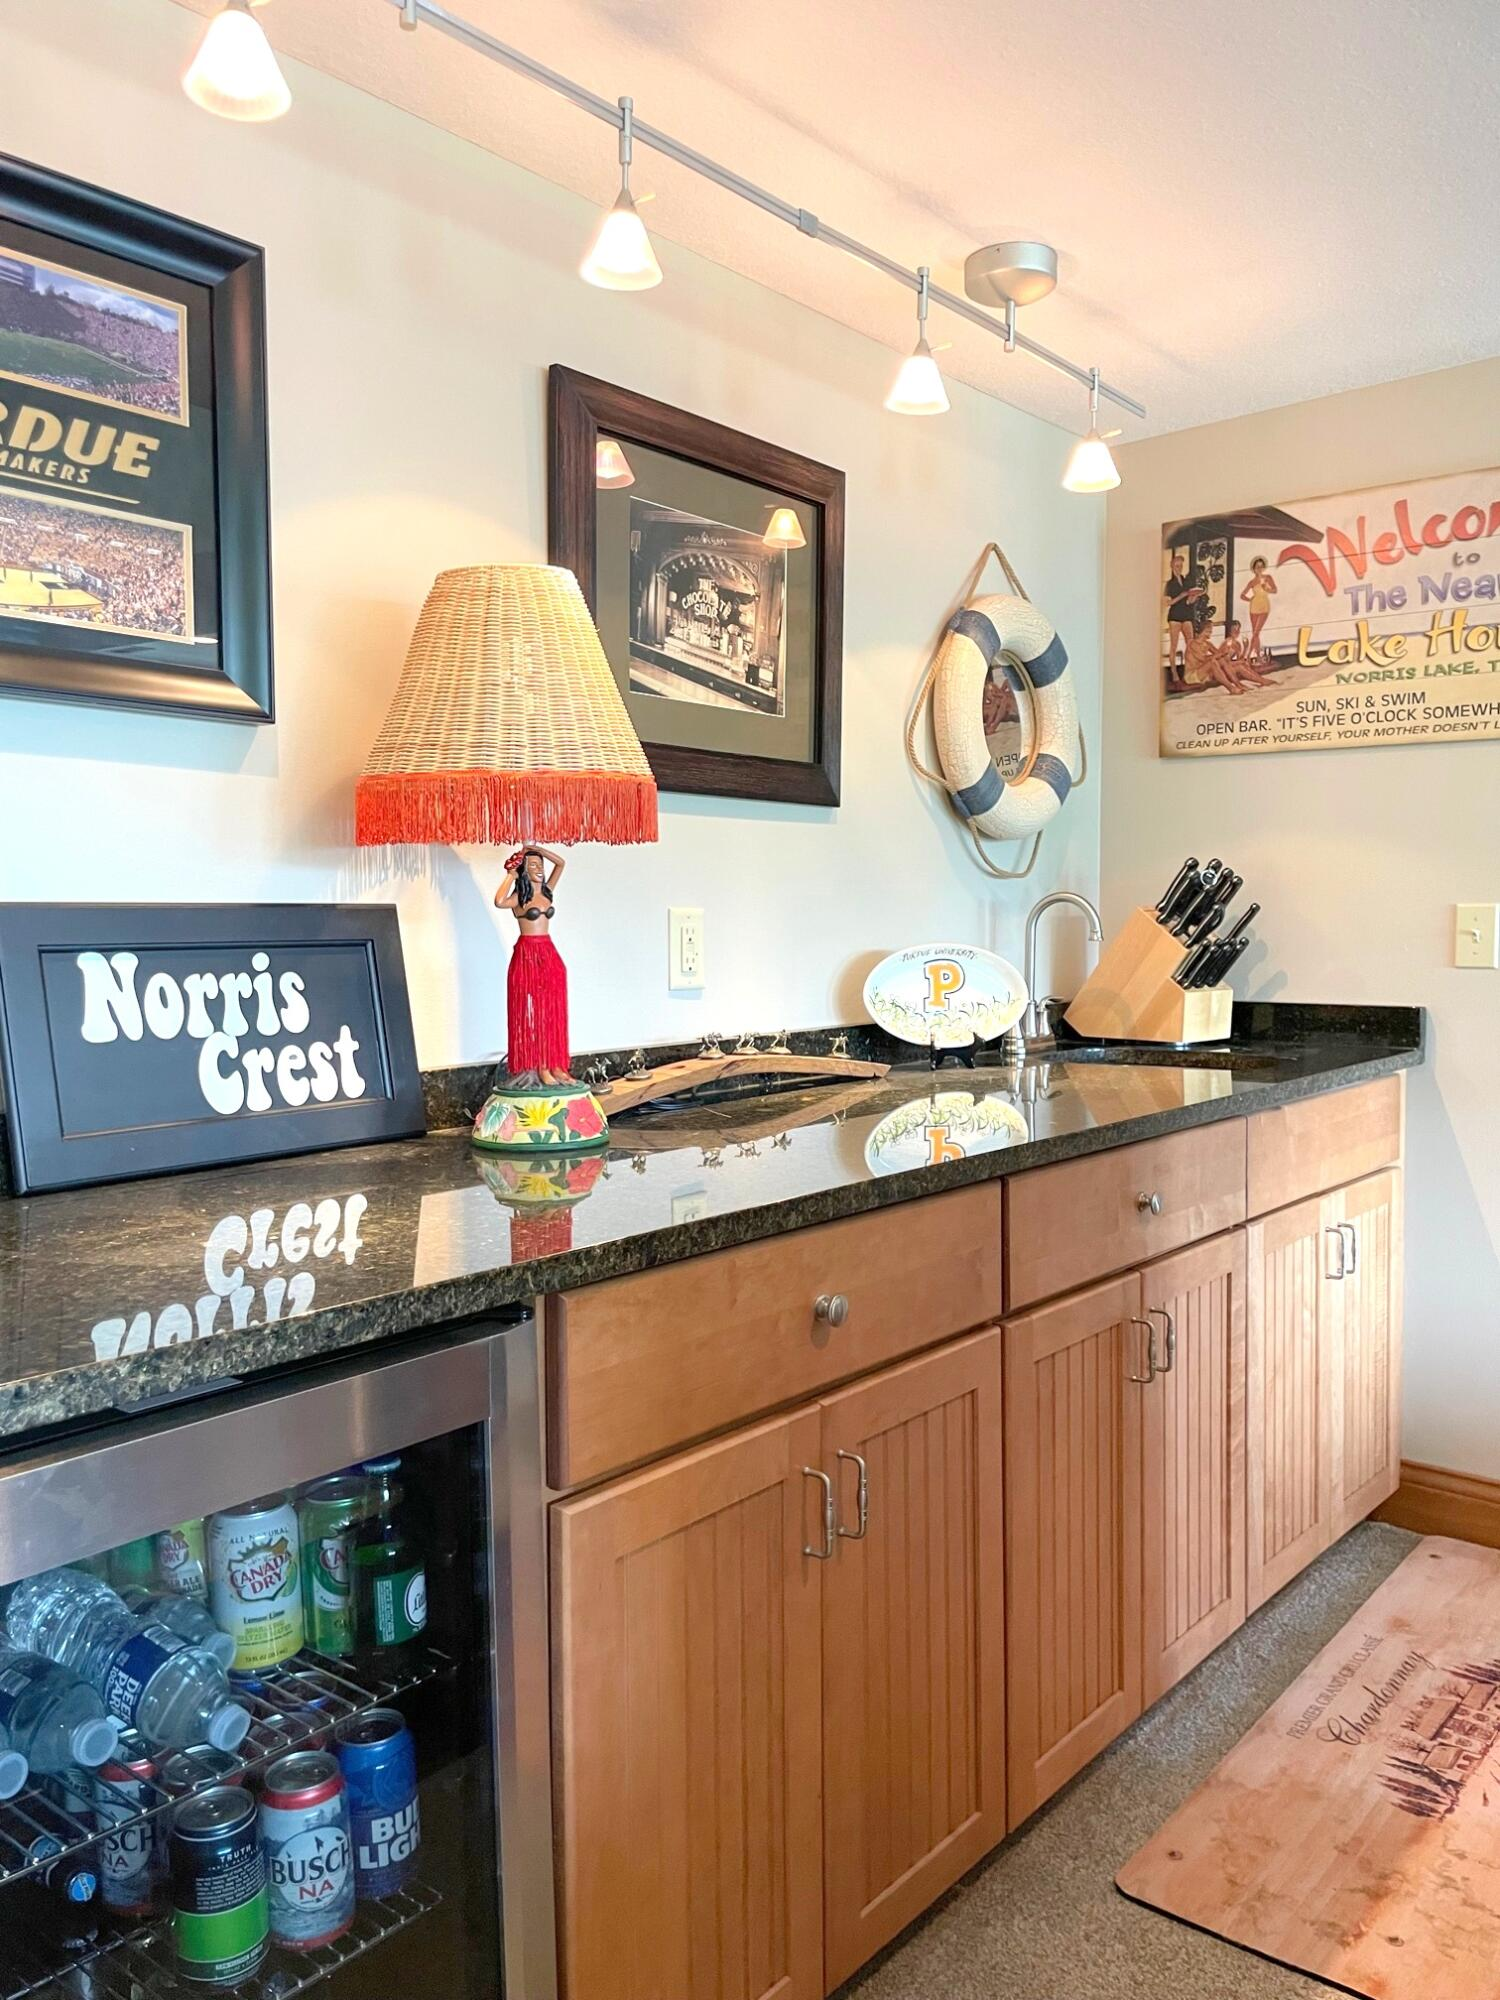 250 Norris Crest Drive: